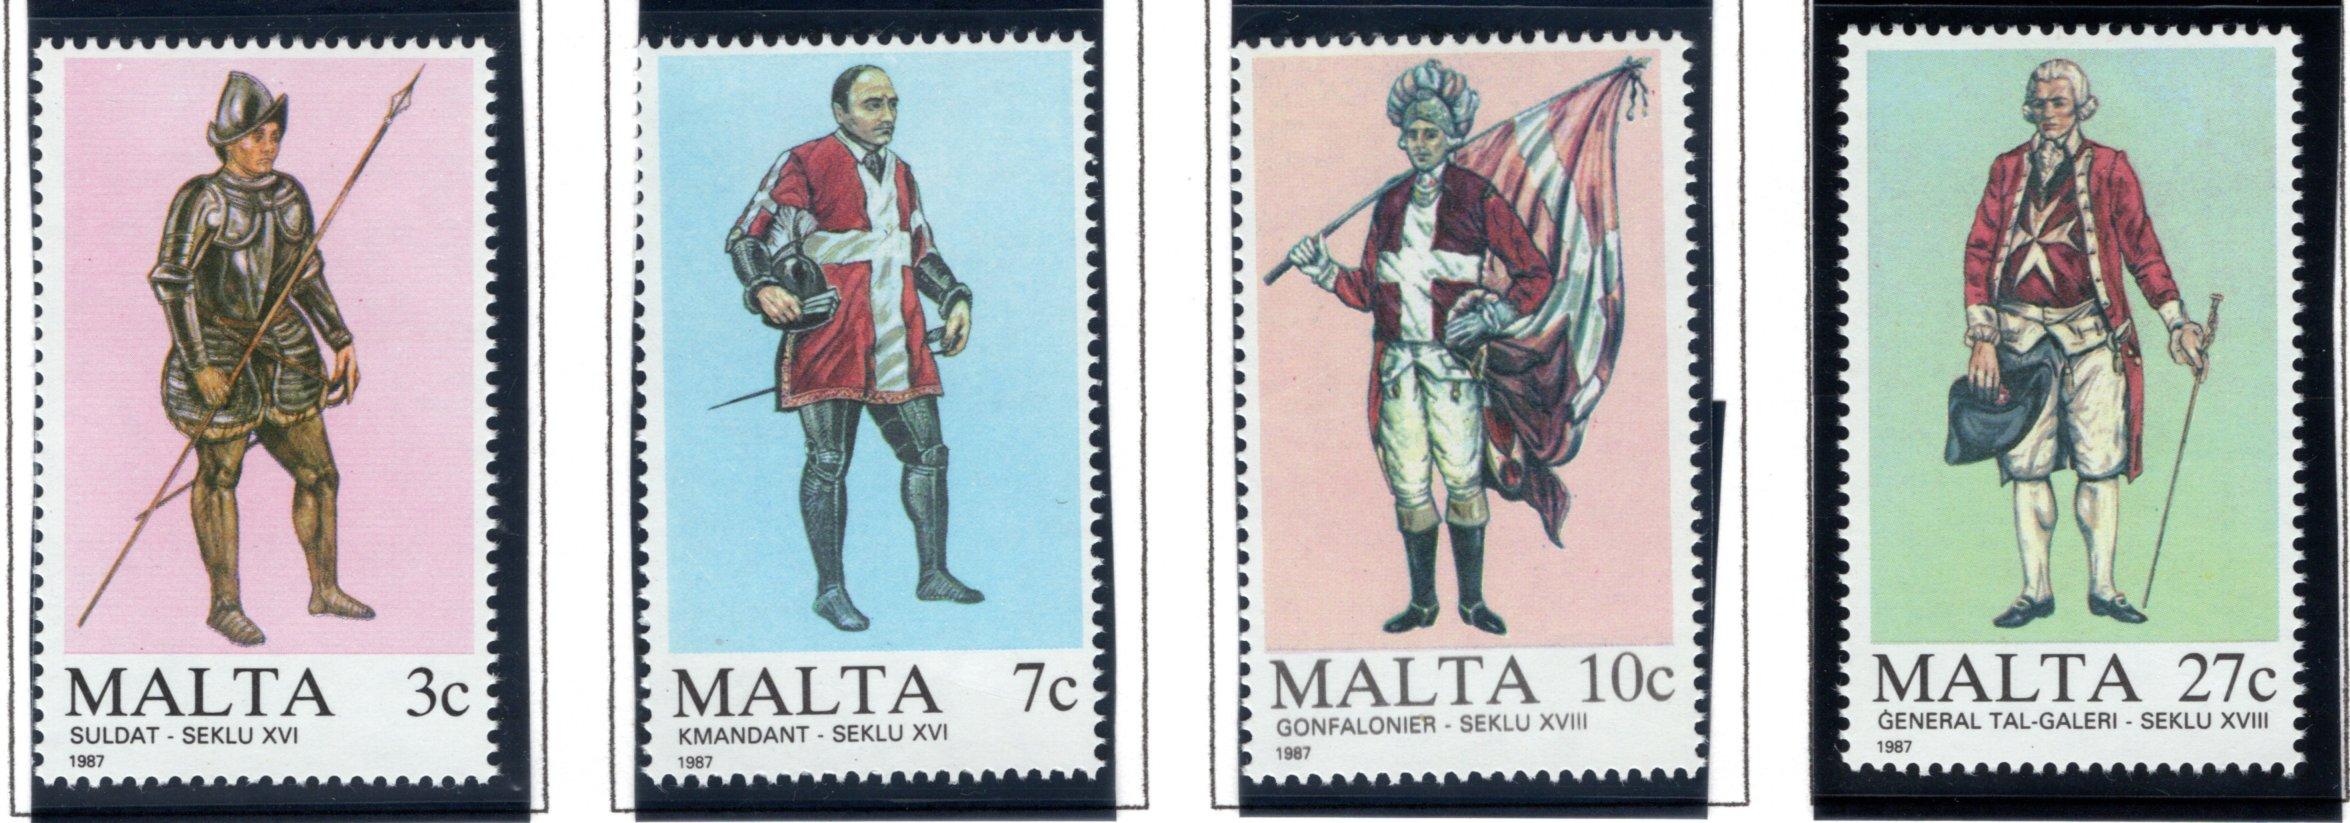 696-699 Malta, Military Uniforms Stamp Set, 1987, MNHOG